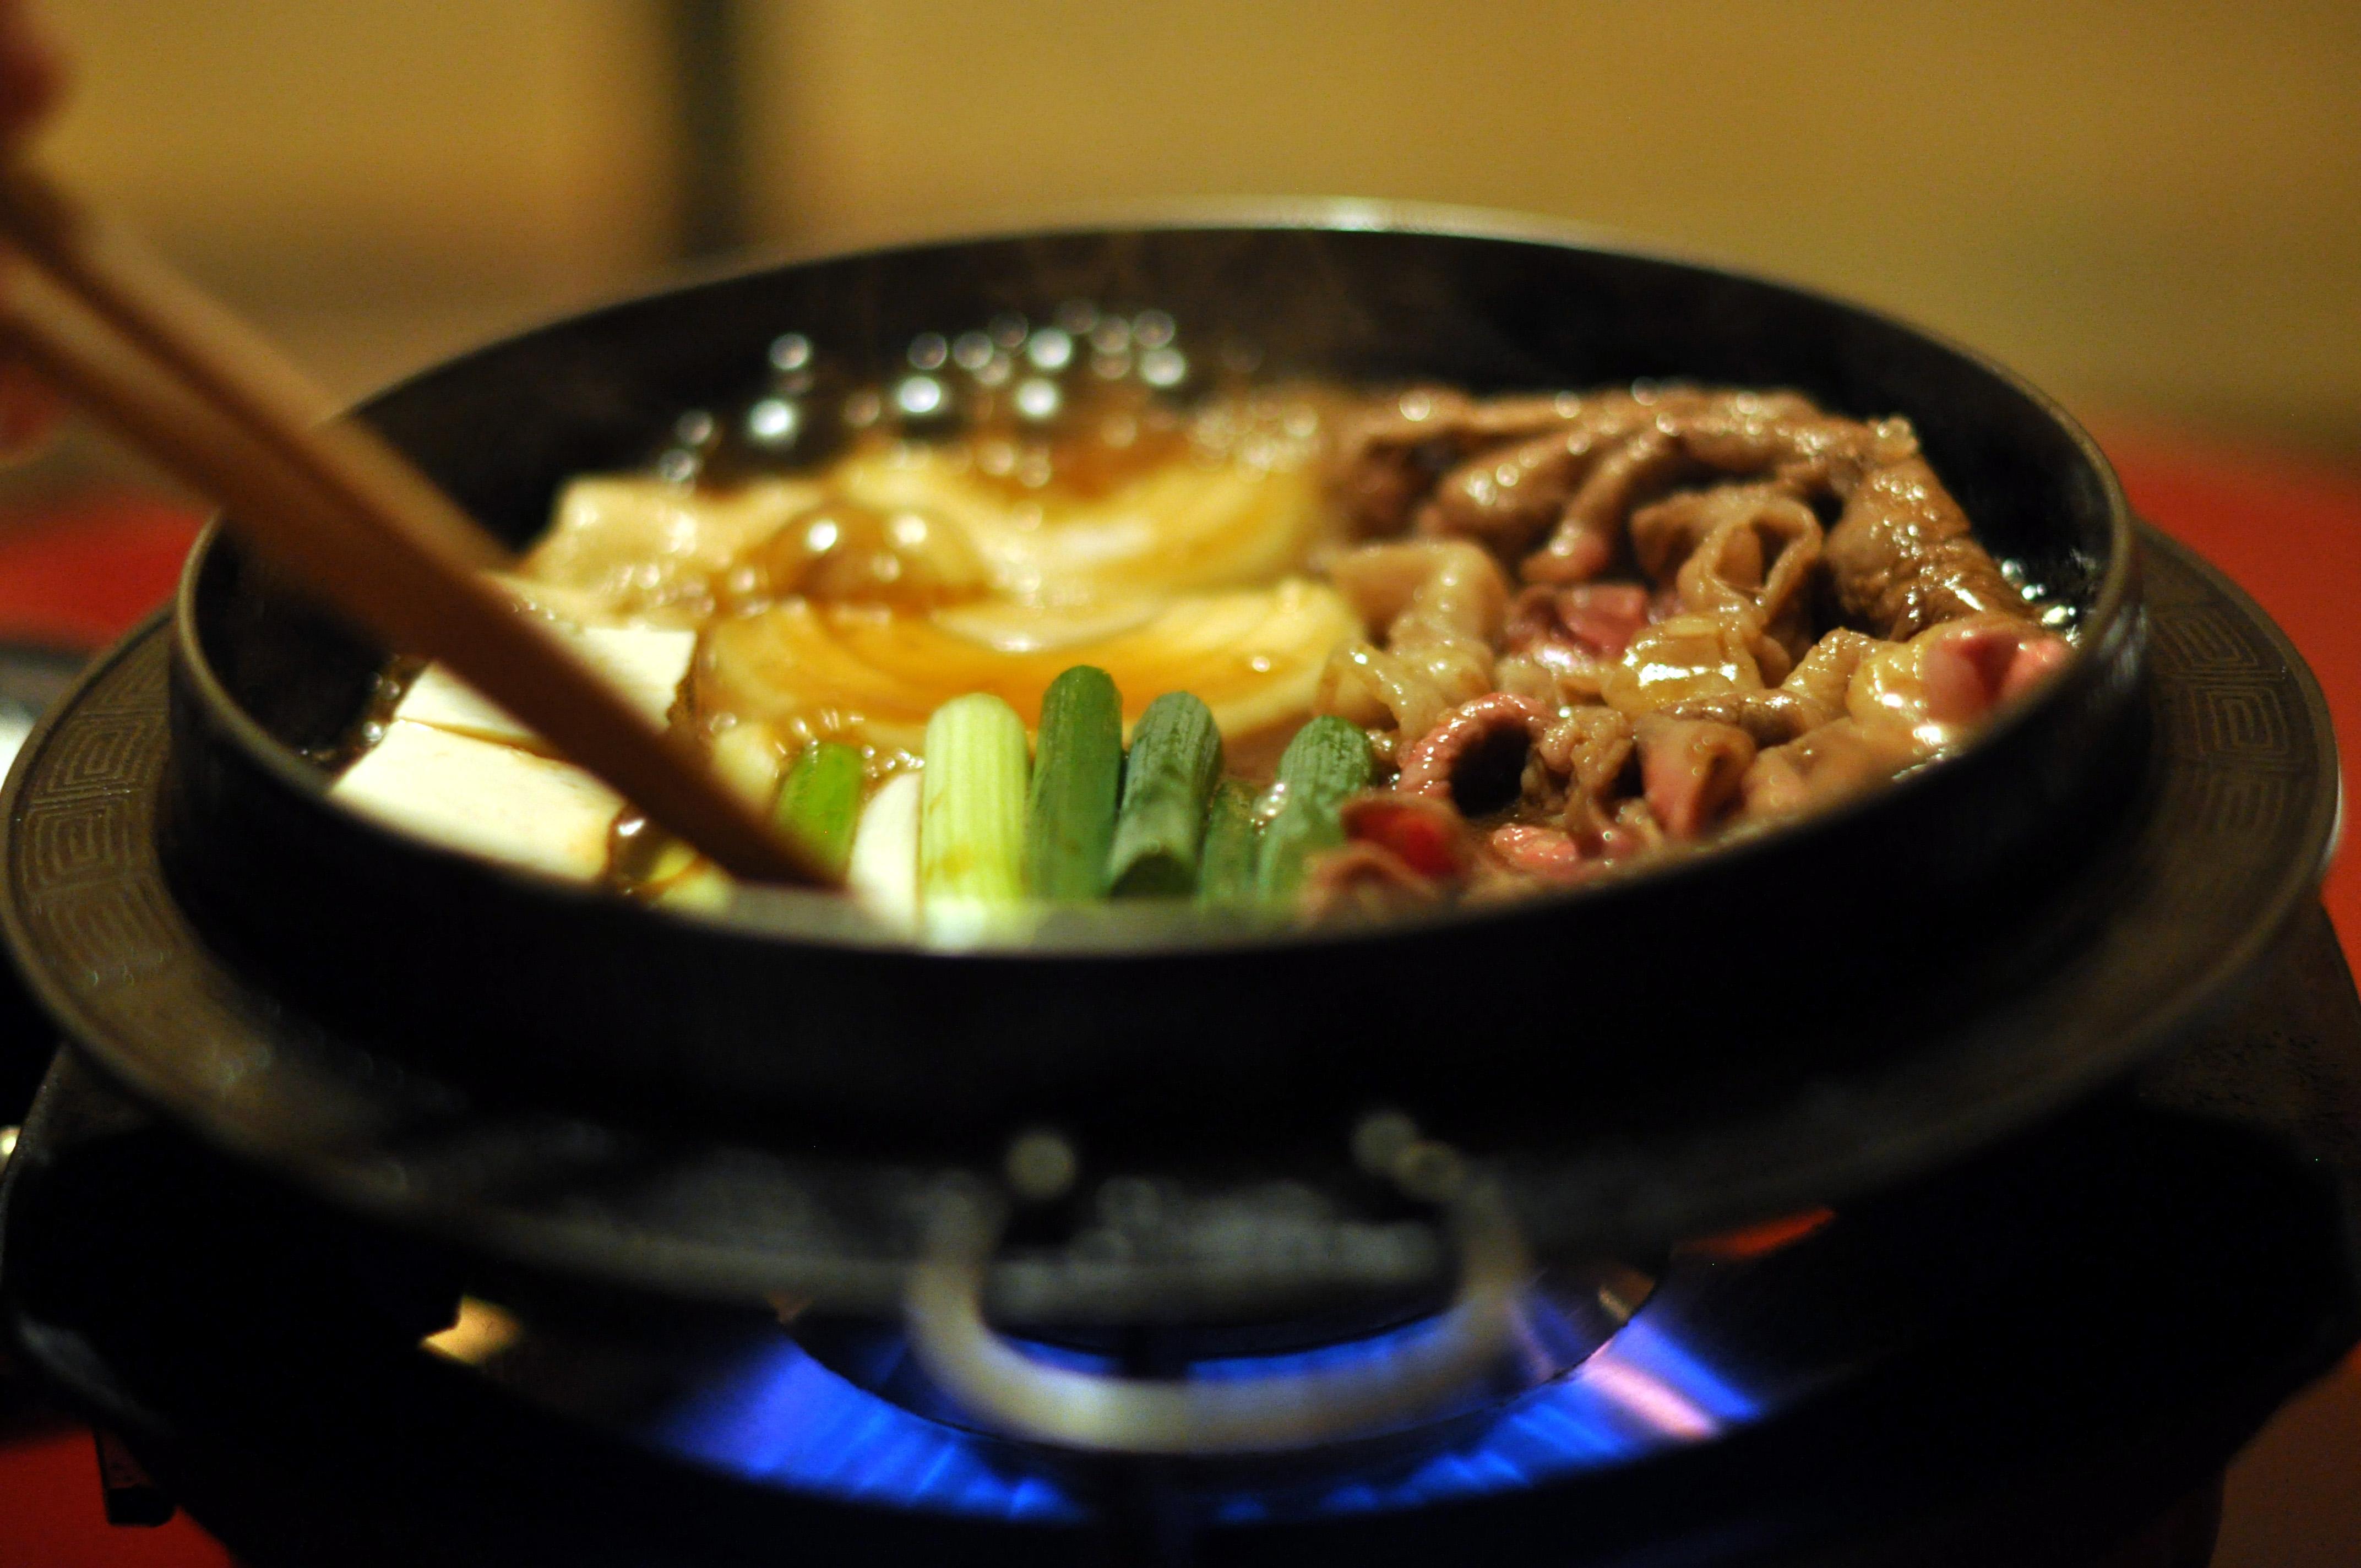 File:Sukiyaki (6290845042).jpg - Wikimedia Commons